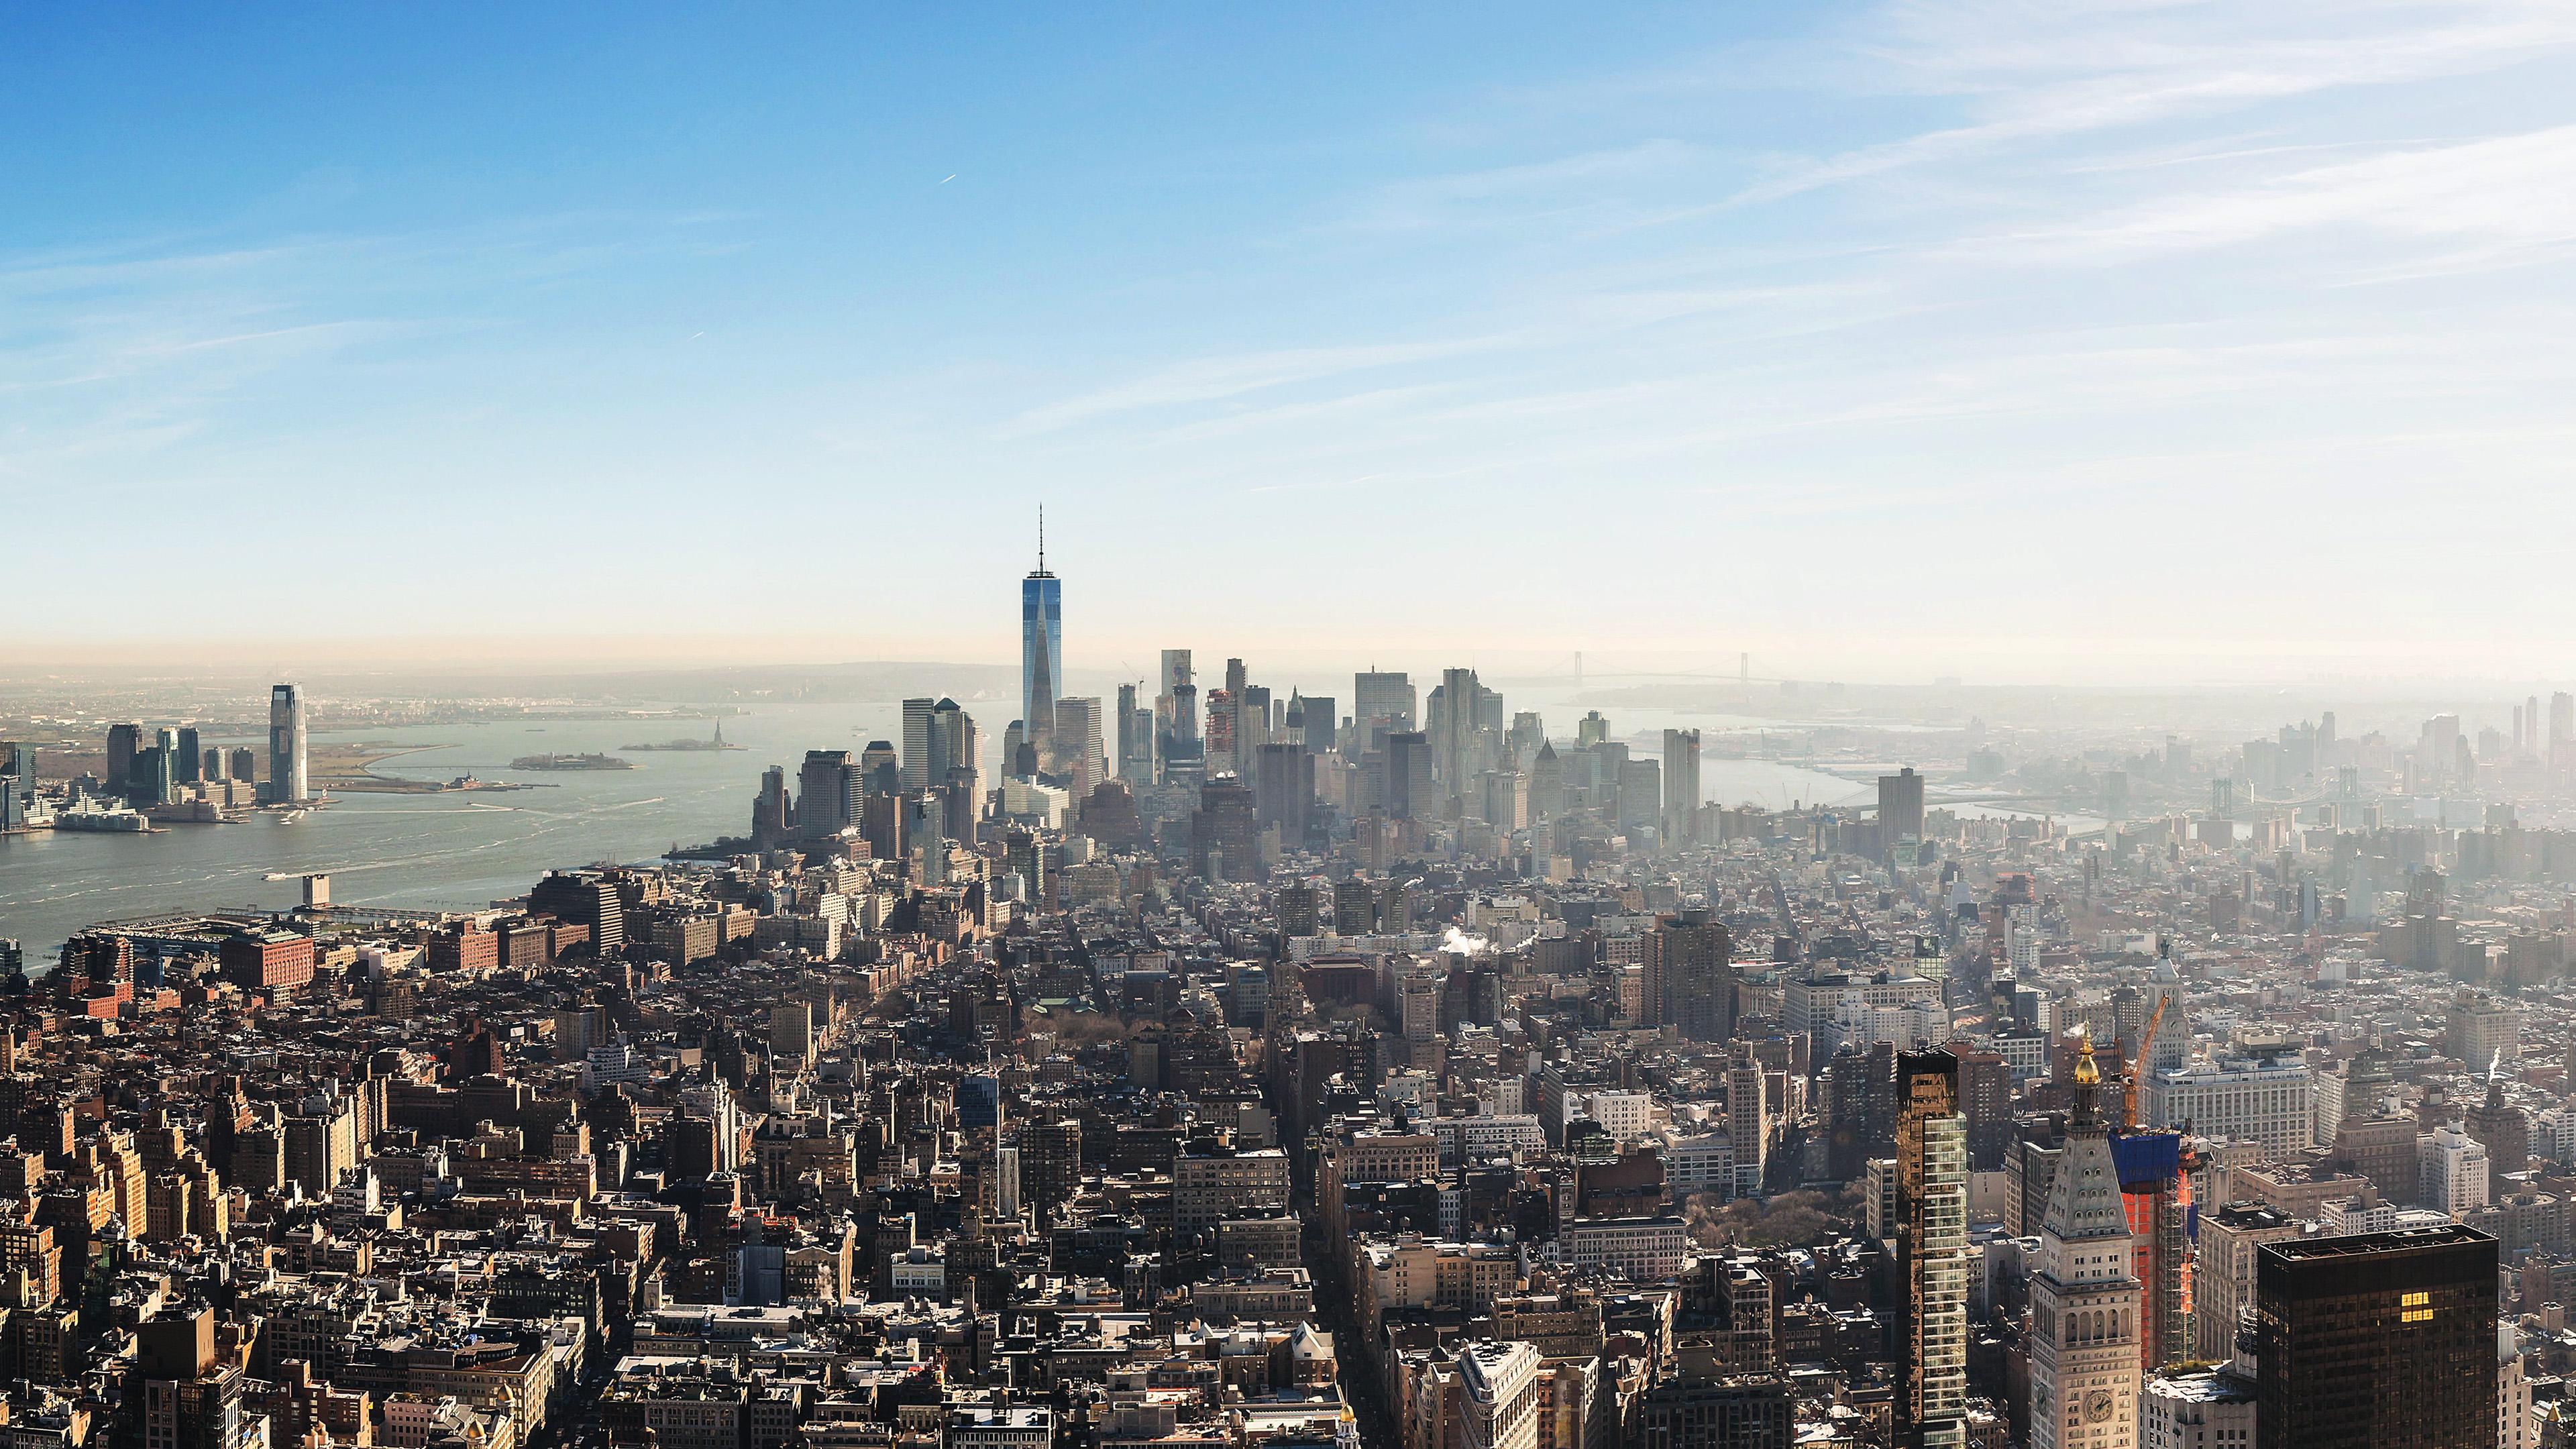 New York City , HD Wallpaper & Backgrounds